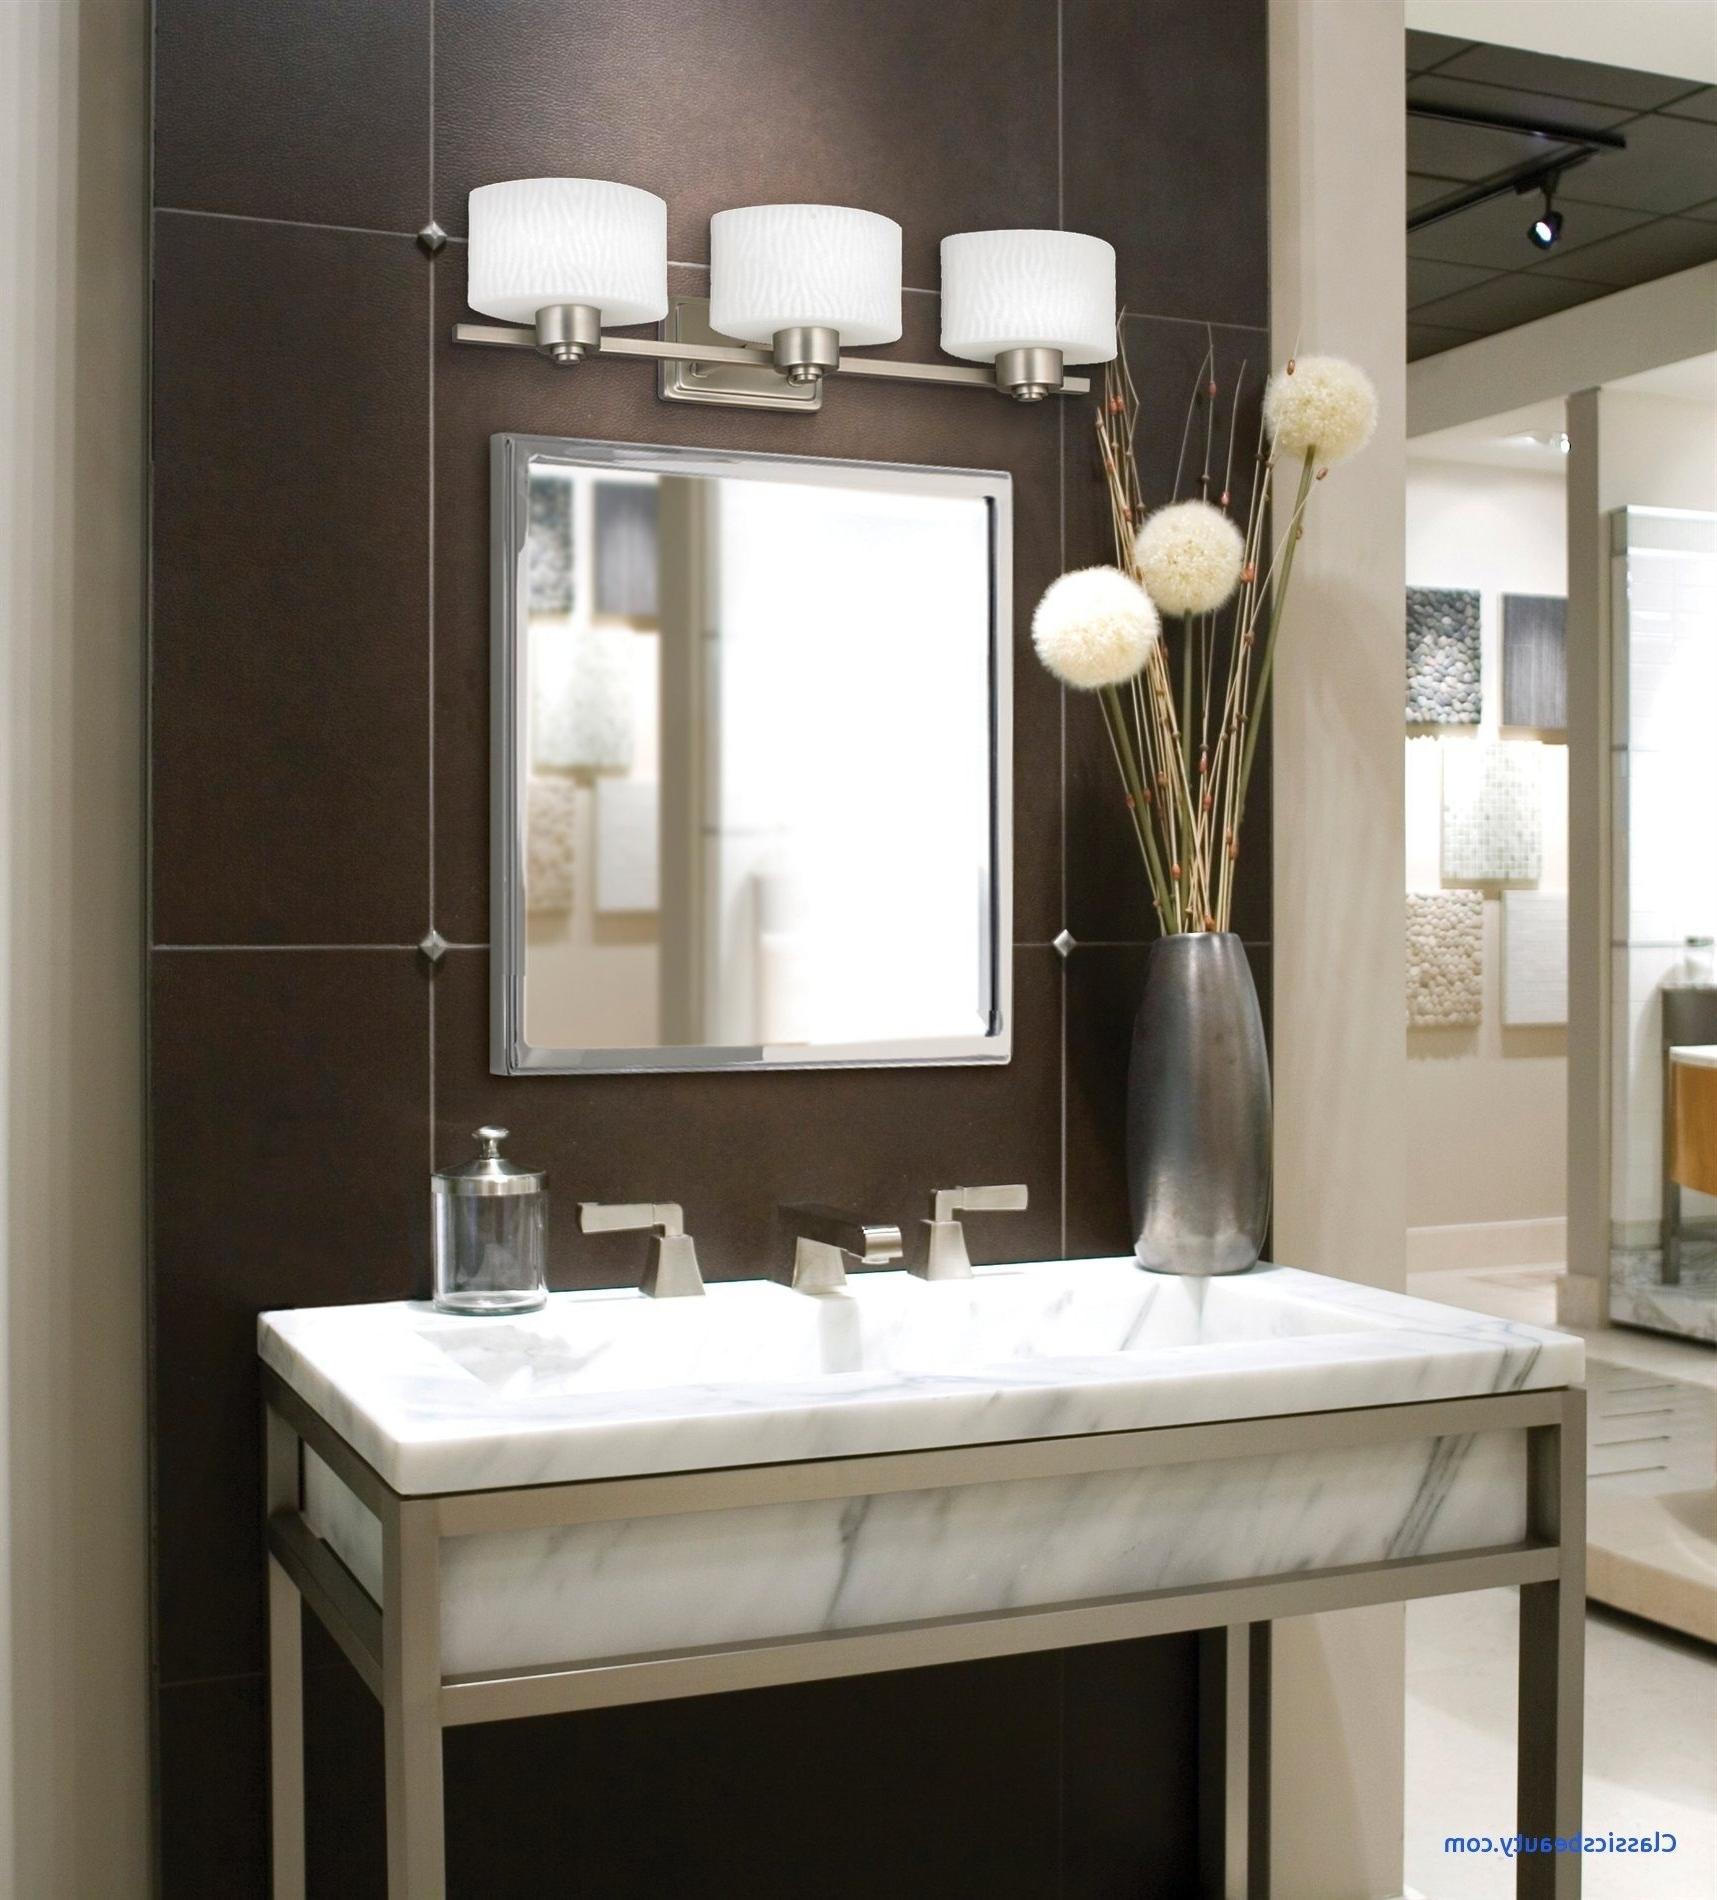 Hanging Bathroom Lights – Nice Hanging Bathroom Lights Tags Inside Best And Newest Chandelier Bathroom Vanity Lighting (View 8 of 15)